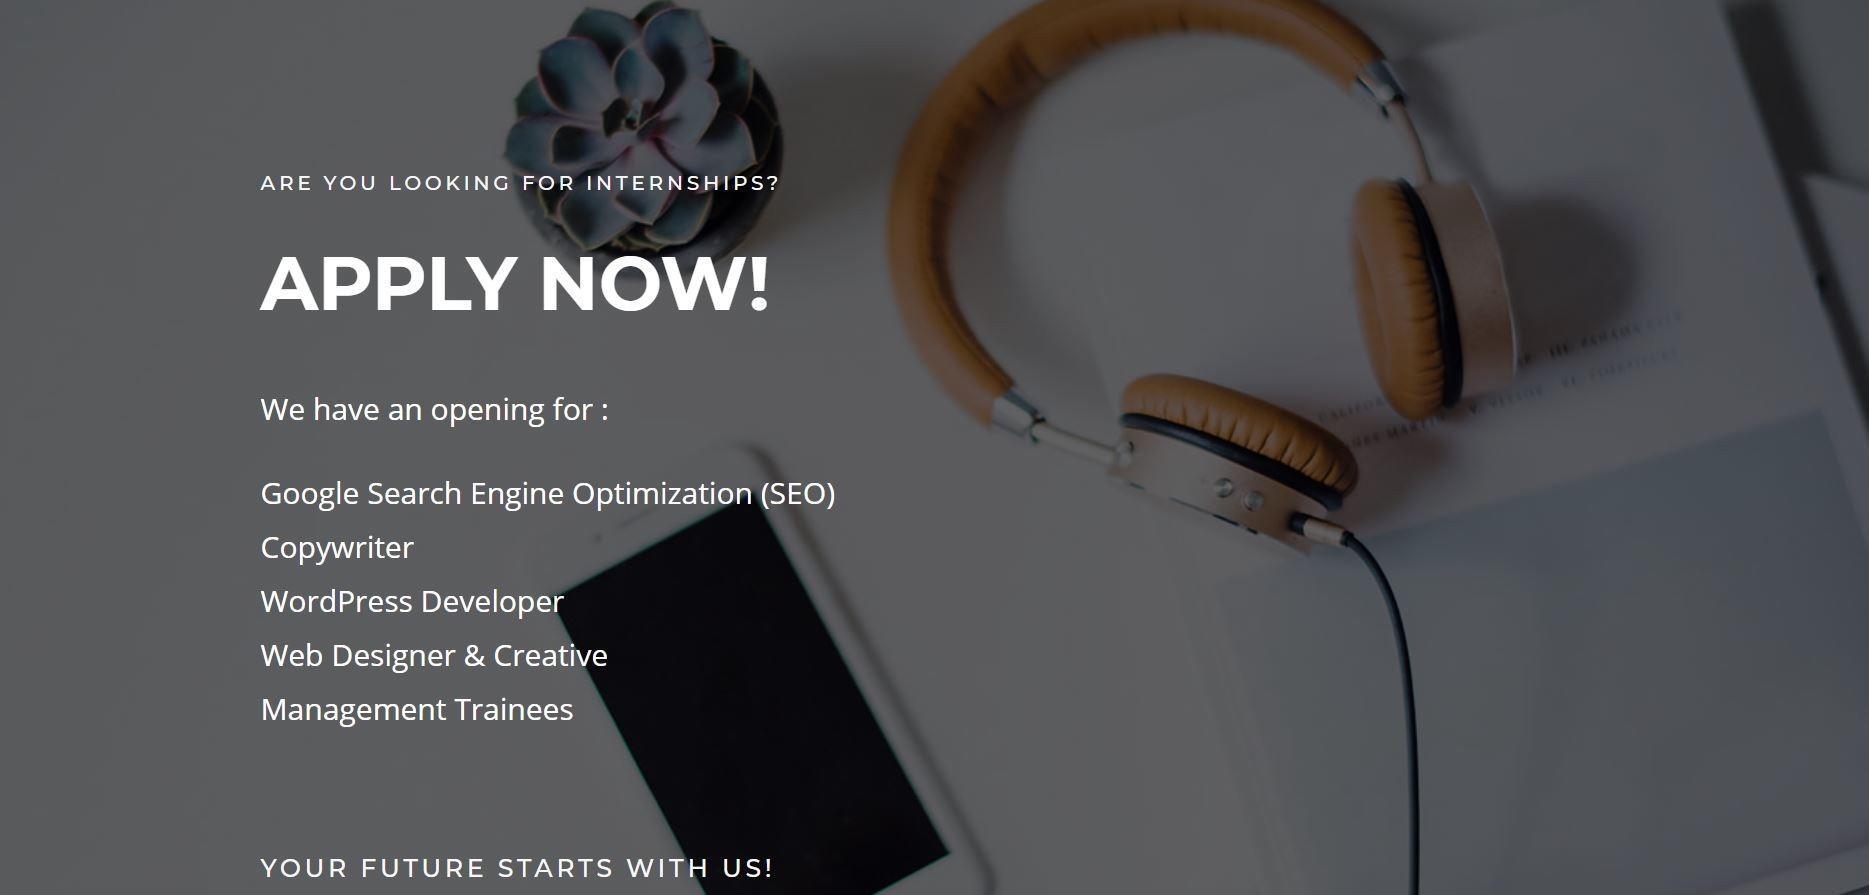 MVN Photo Studio Digital Marketing Internship (Virtual OJT)